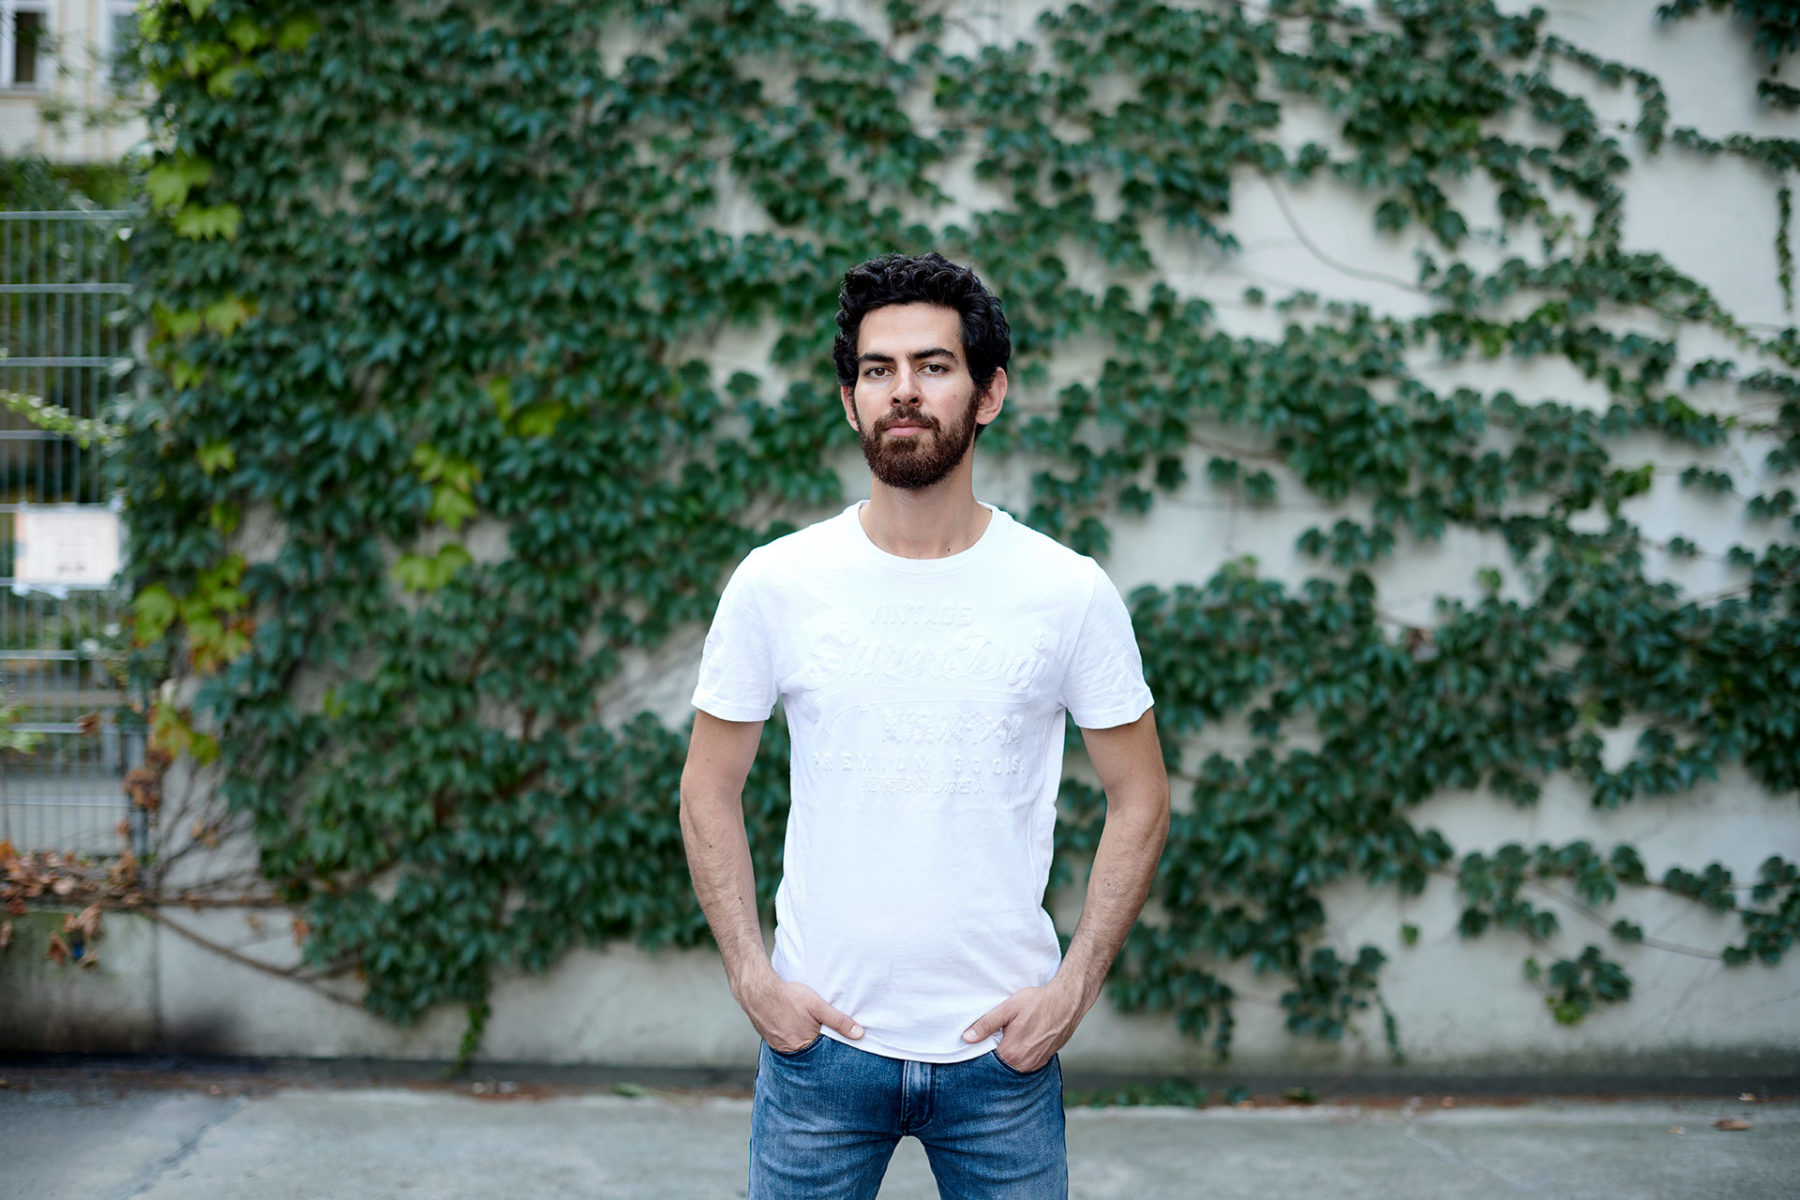 Portraitfotograf Berlin Friedrichshain Schauspielerportraits Sedcard Fotos